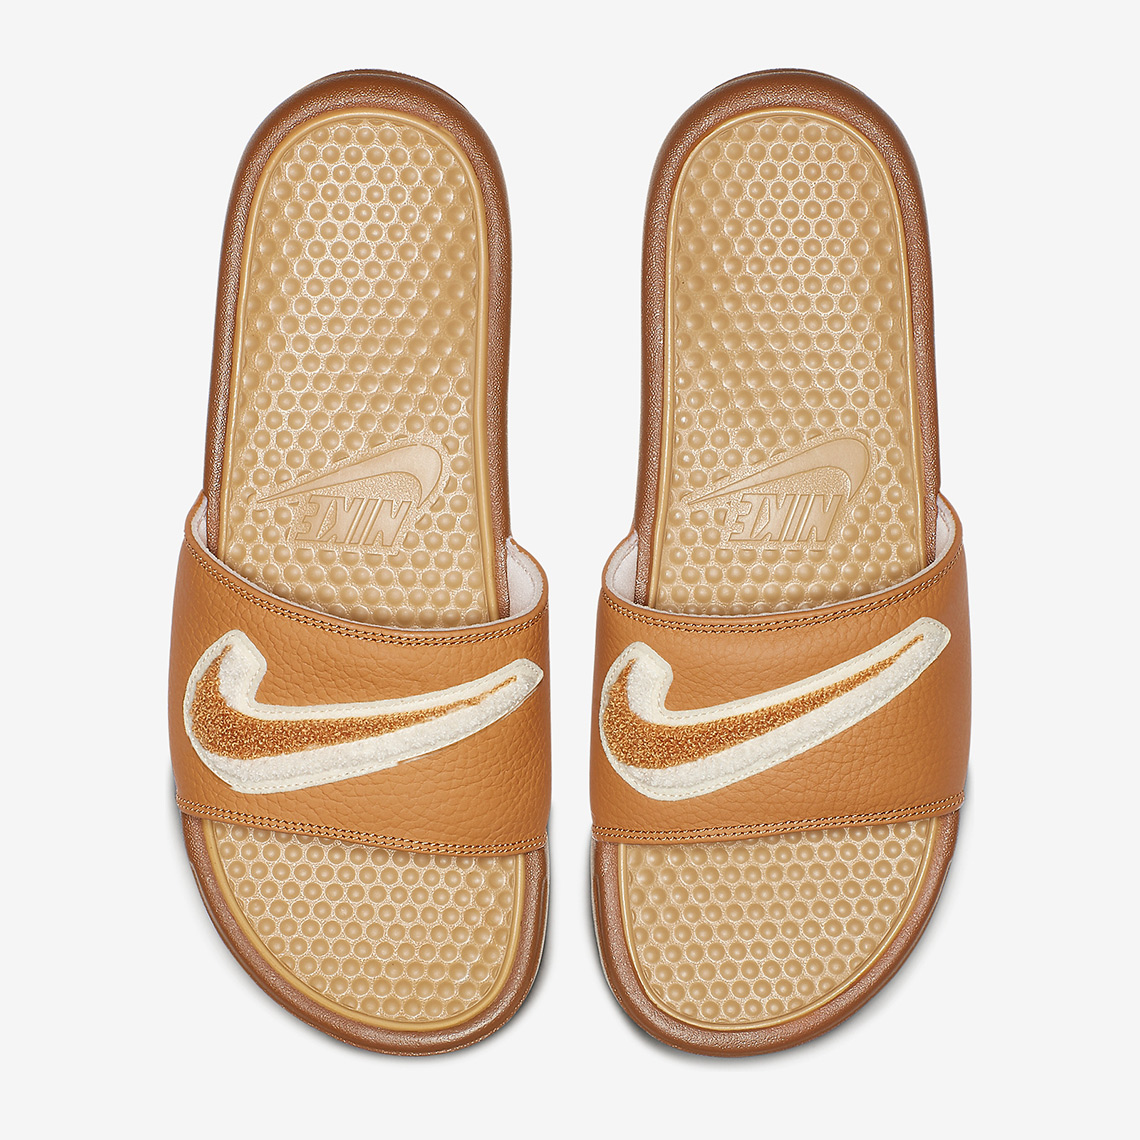 reputable site 91e9b c6ff9 Nike Benassi JDI Available Now on Nike.com  45. Color  Muted Bronze Light  Cream Light Bone Club Gold Style Code  AO2805-200